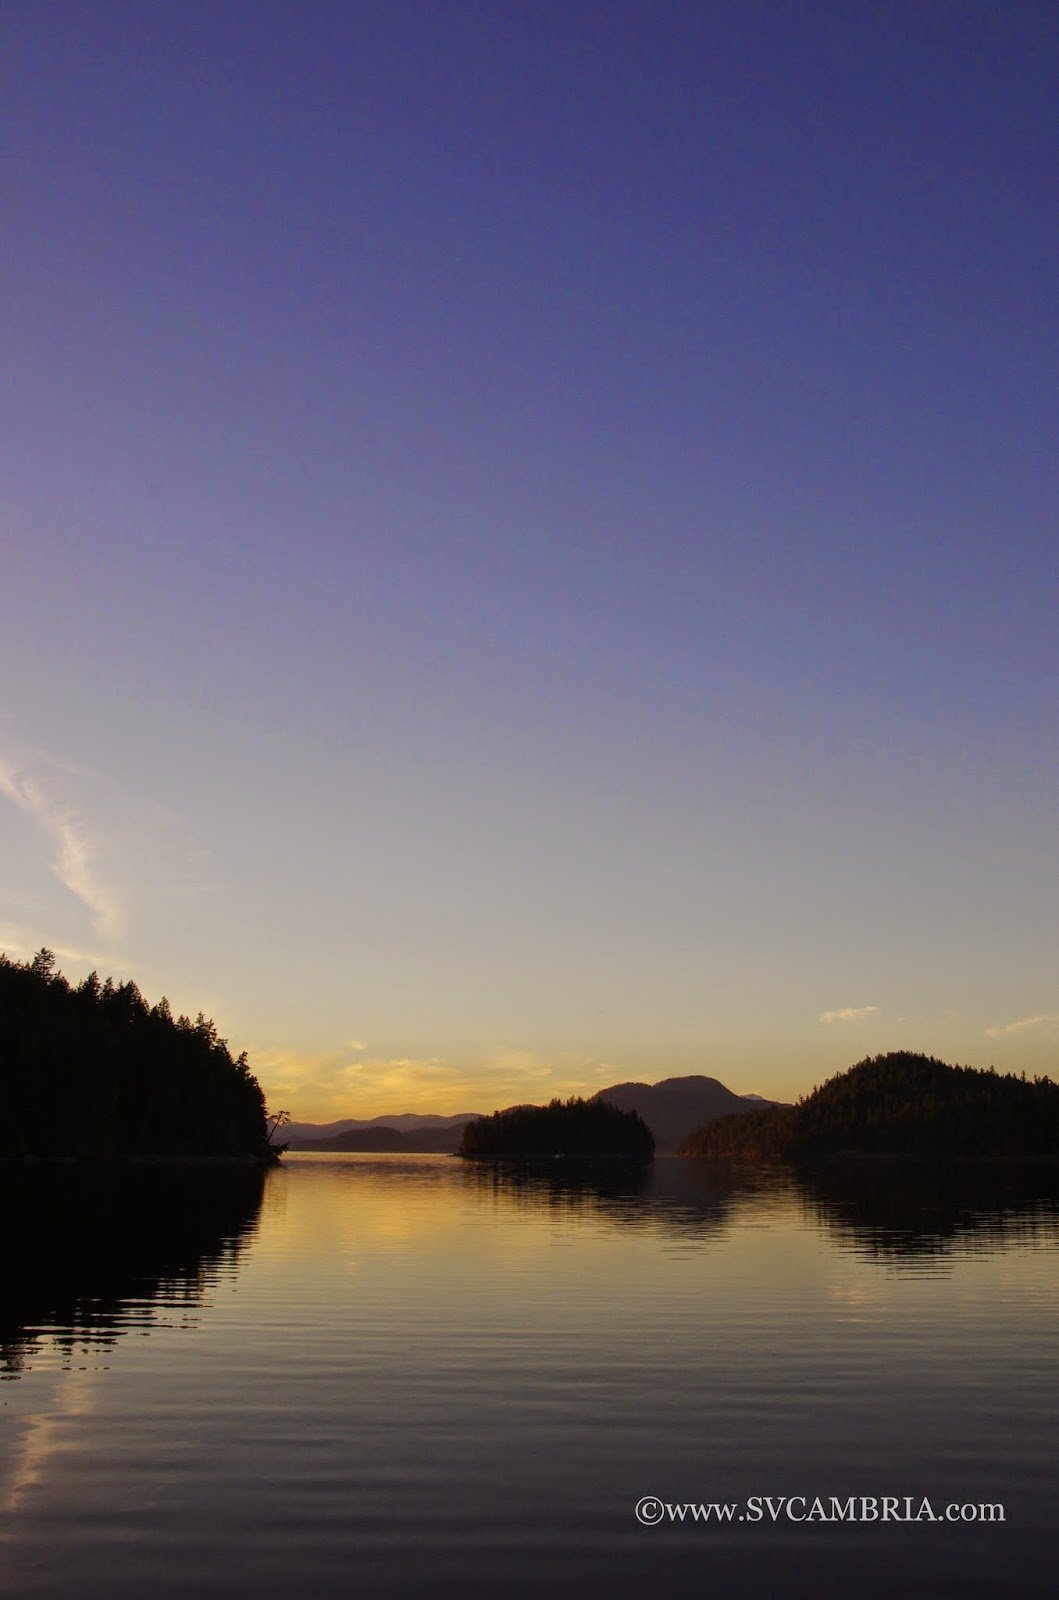 Sunset in Carrington Bay, Cortes Island.